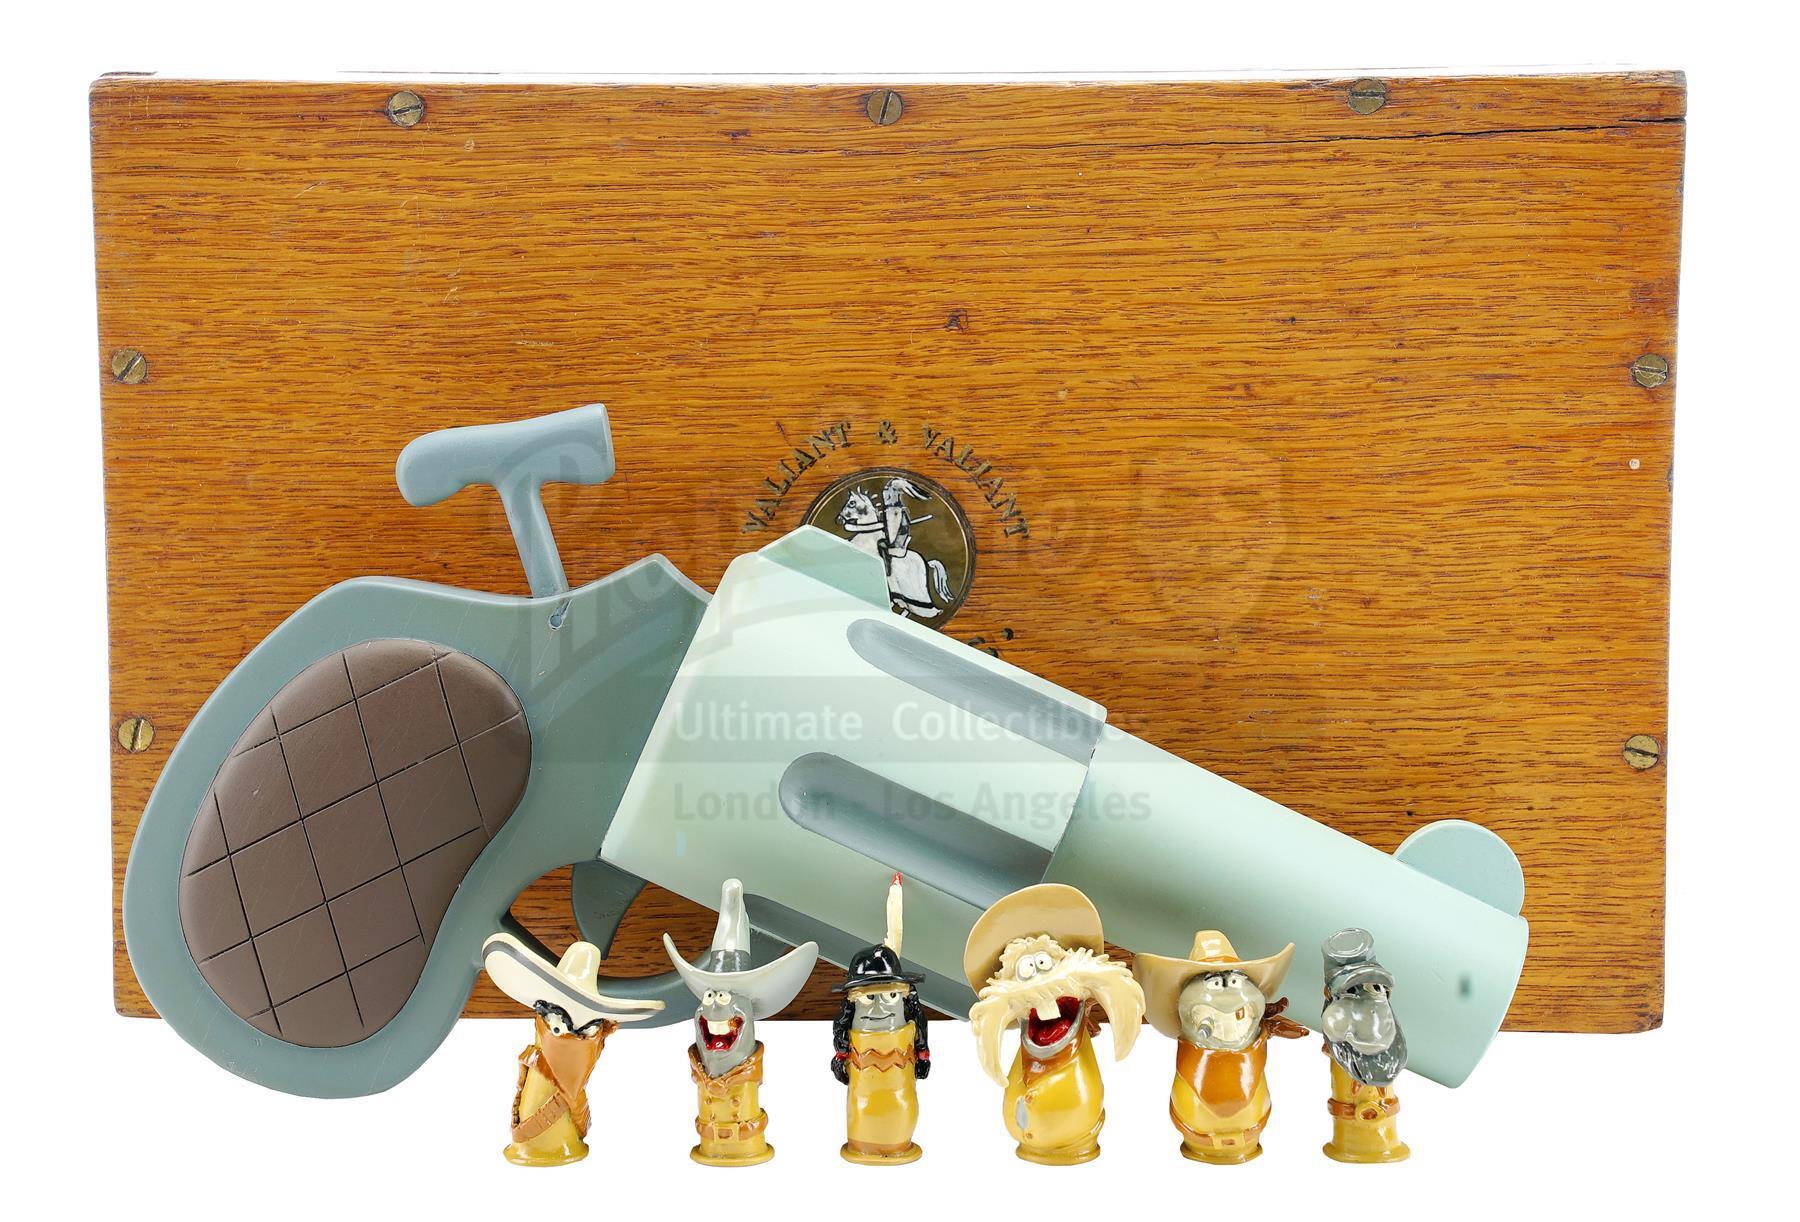 Lot # 424: WHO FRAMED ROGER RABBIT - Eddie Valiant's (Bob Hoskins) Screen-Matched Pistol Case, Toon